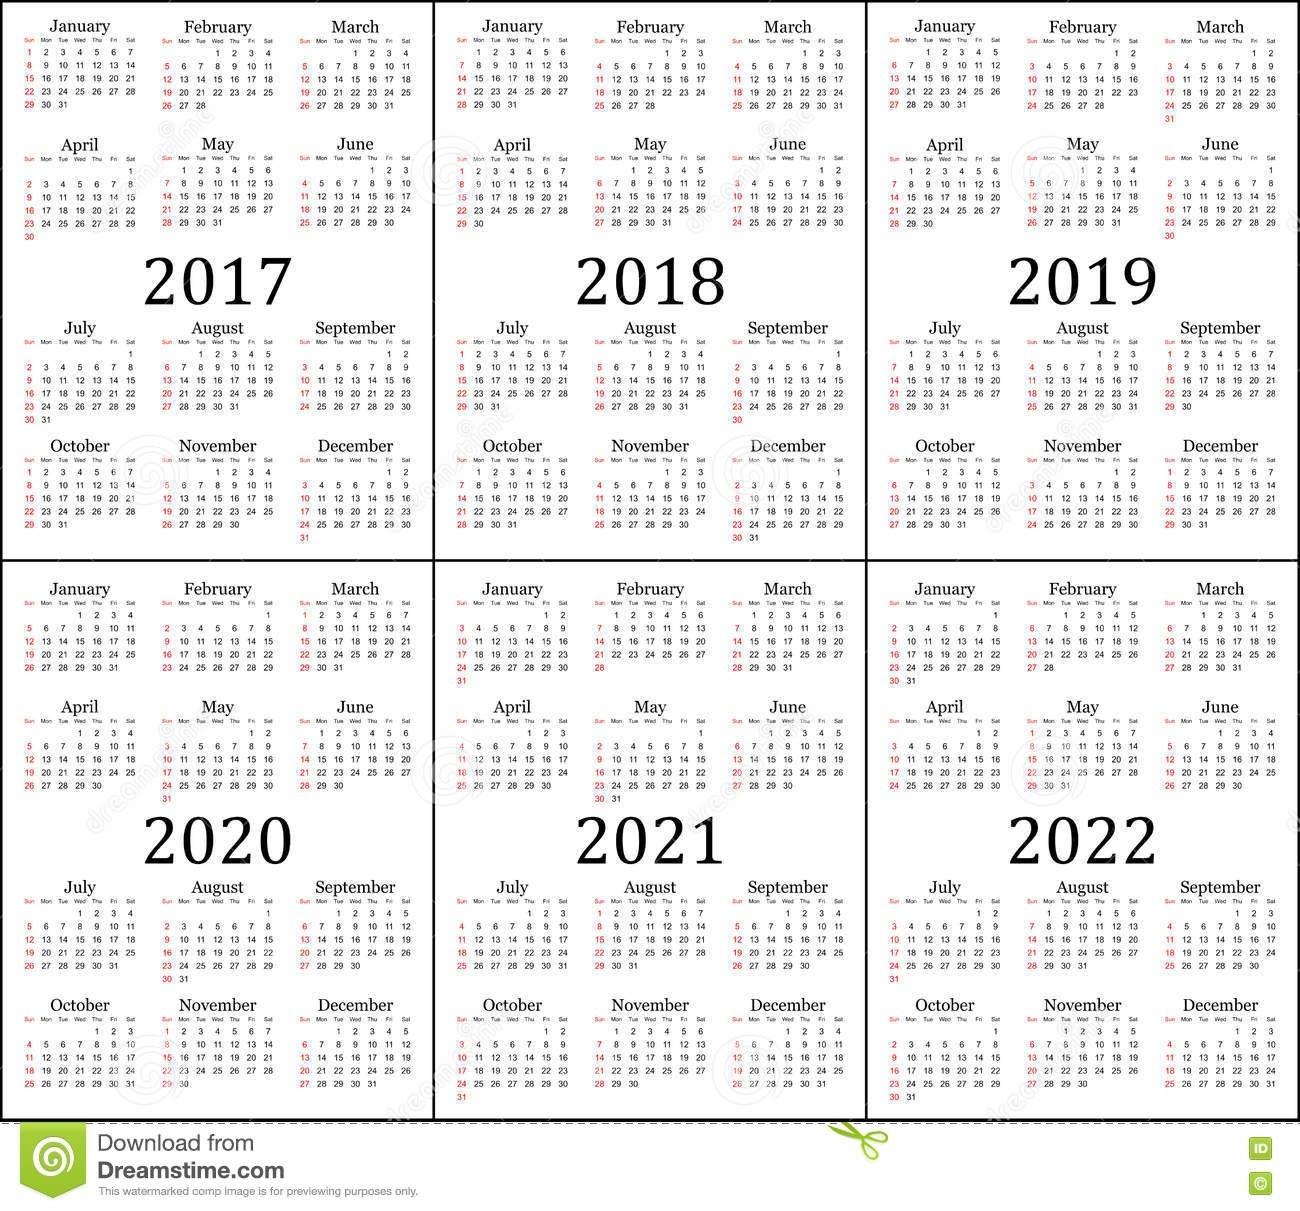 Six Year Calendar - 2017, 2018, 2019, 2020, 2021 And 2022 Stock 4 Year Calendar 2019 To 2022